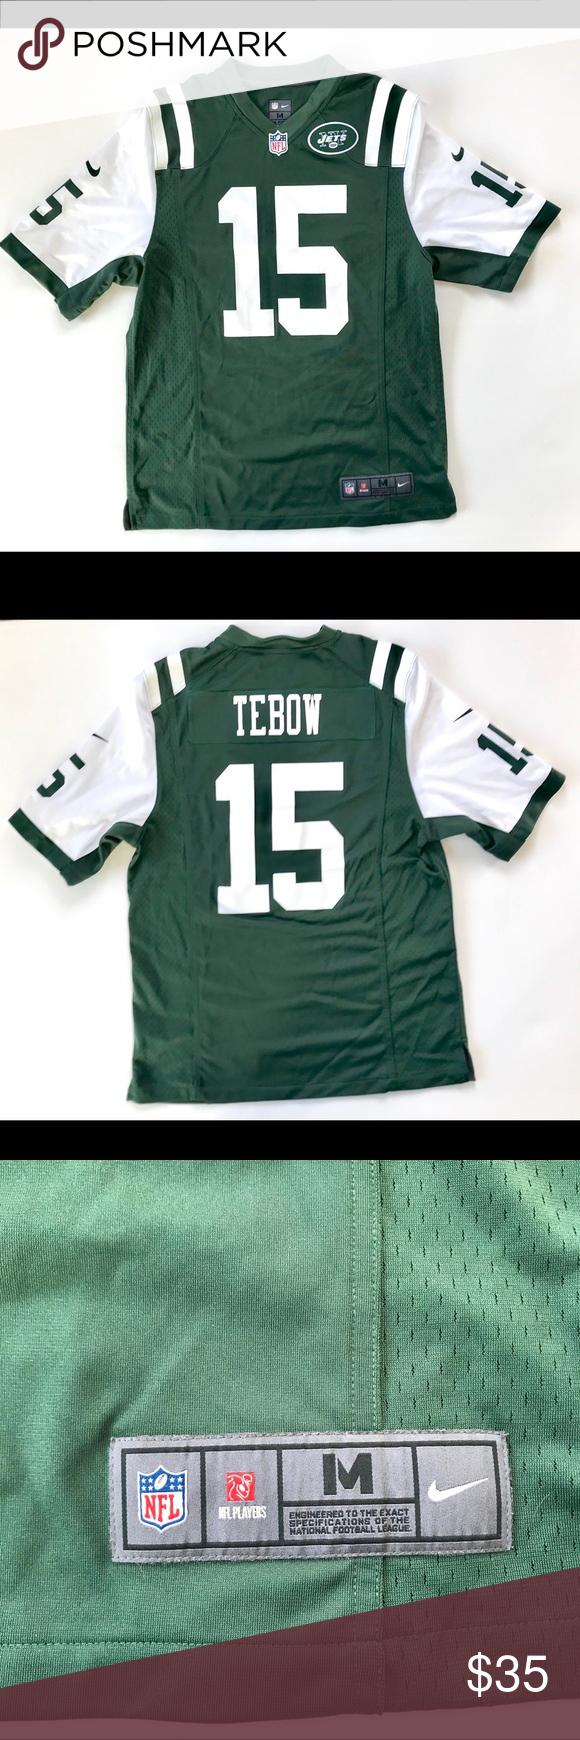 newest 98b46 e5e14 Men's Nike On Field Tim Tebow NY Jets Jersey M Men's Nike On ...